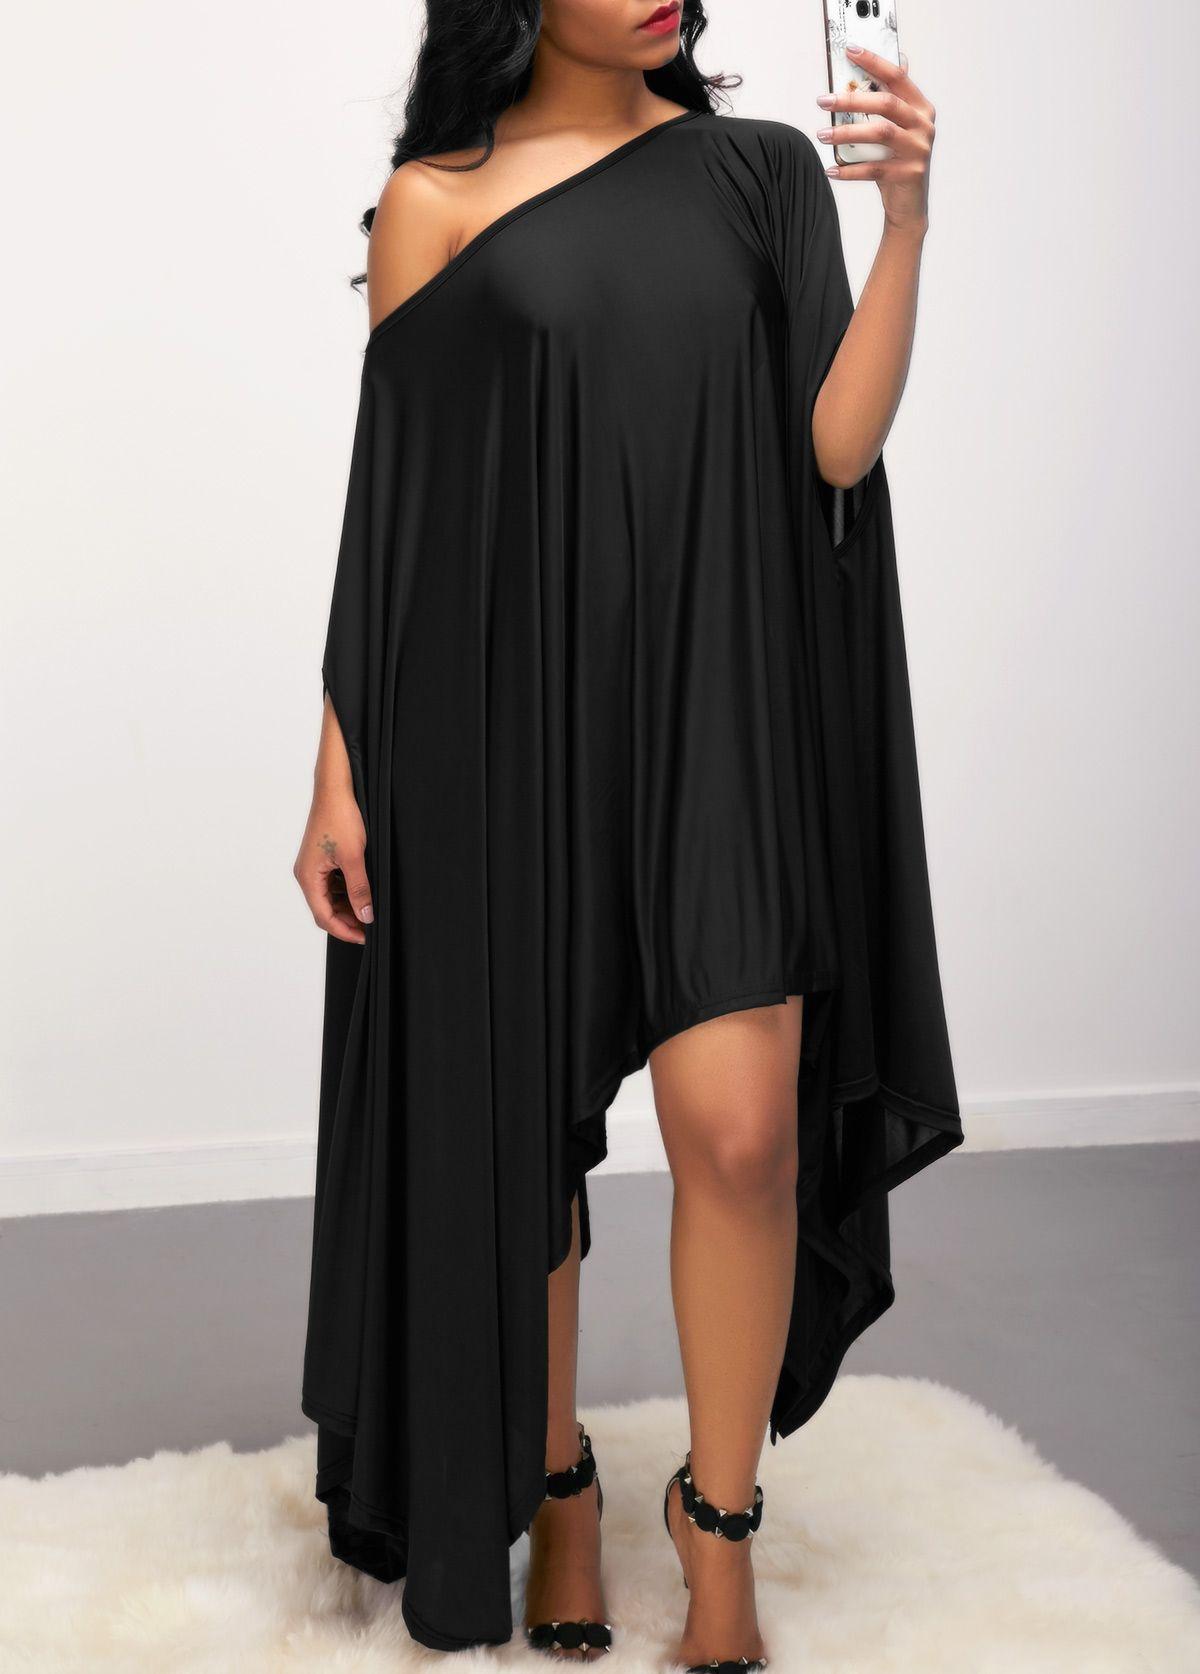 Skew Neck Asymmetric Hem Black Dress on sale only US$26 85 now